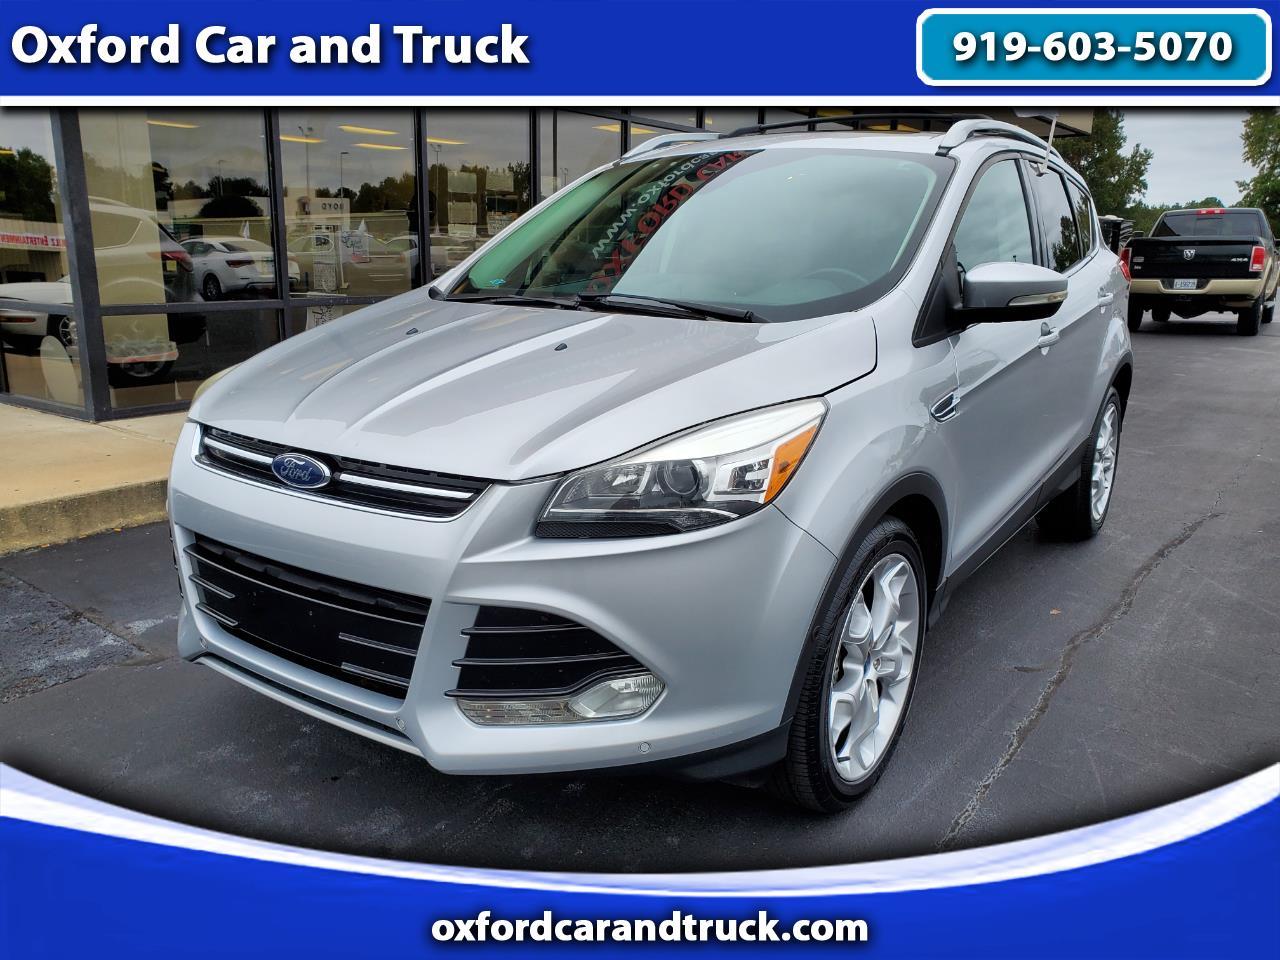 Ford Escape FWD 4dr Titanium 2015